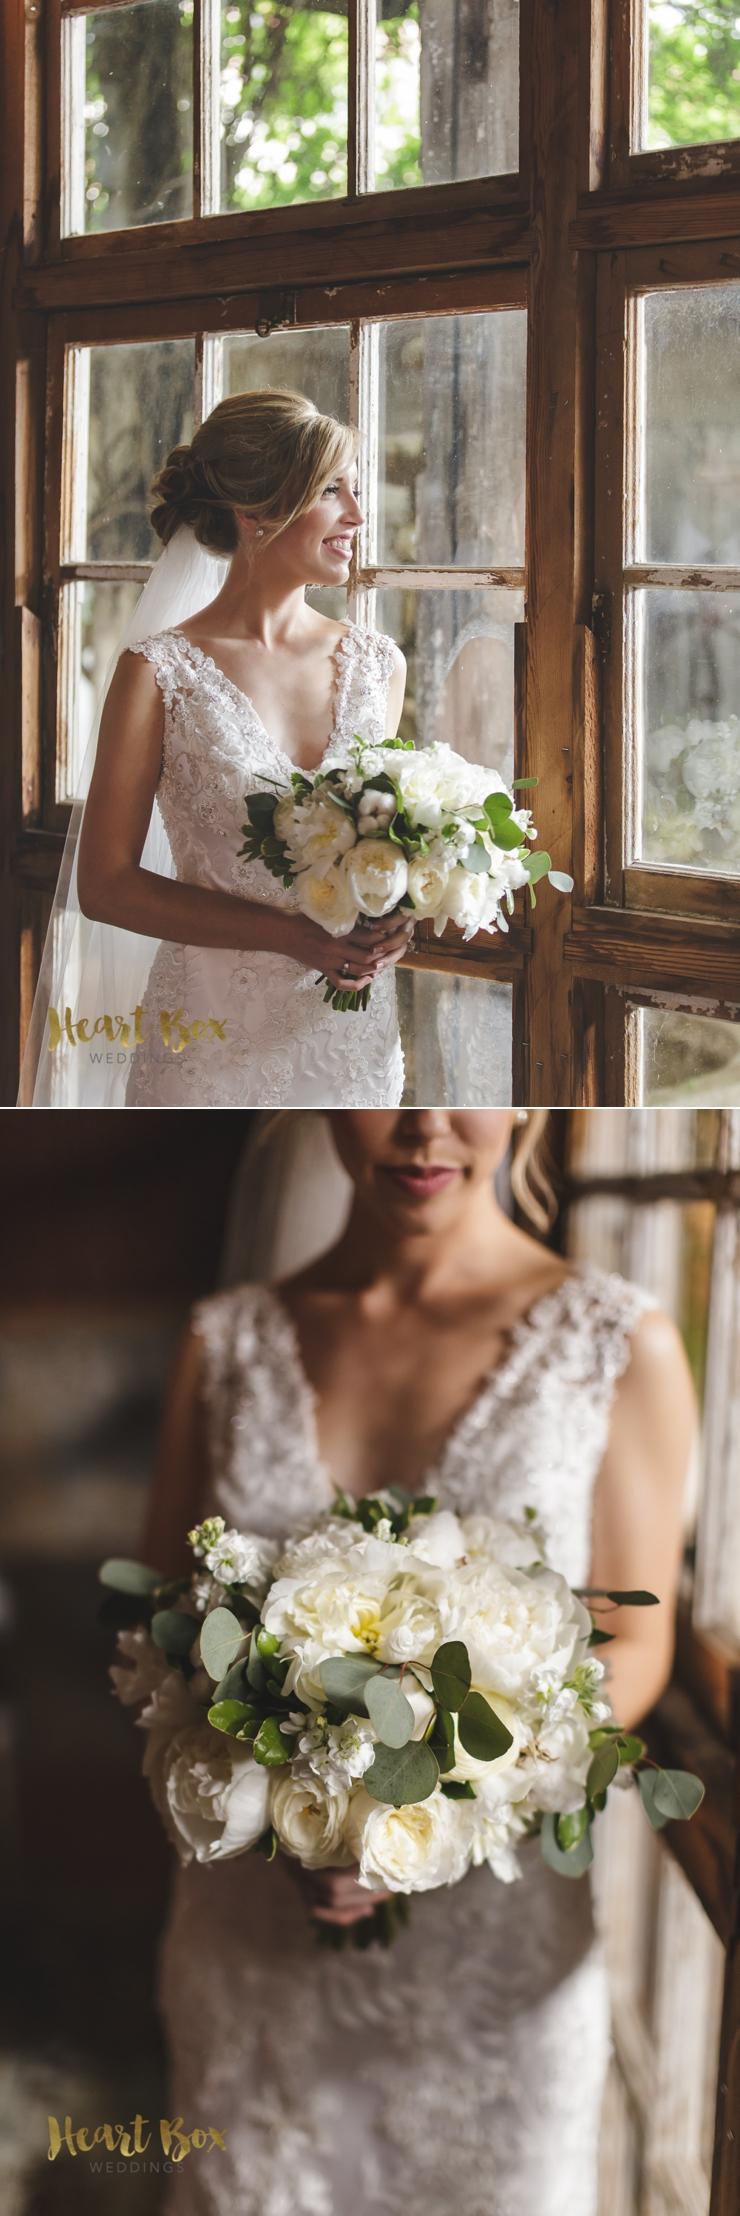 Popplewell Wedding Blog Collages 13.jpg